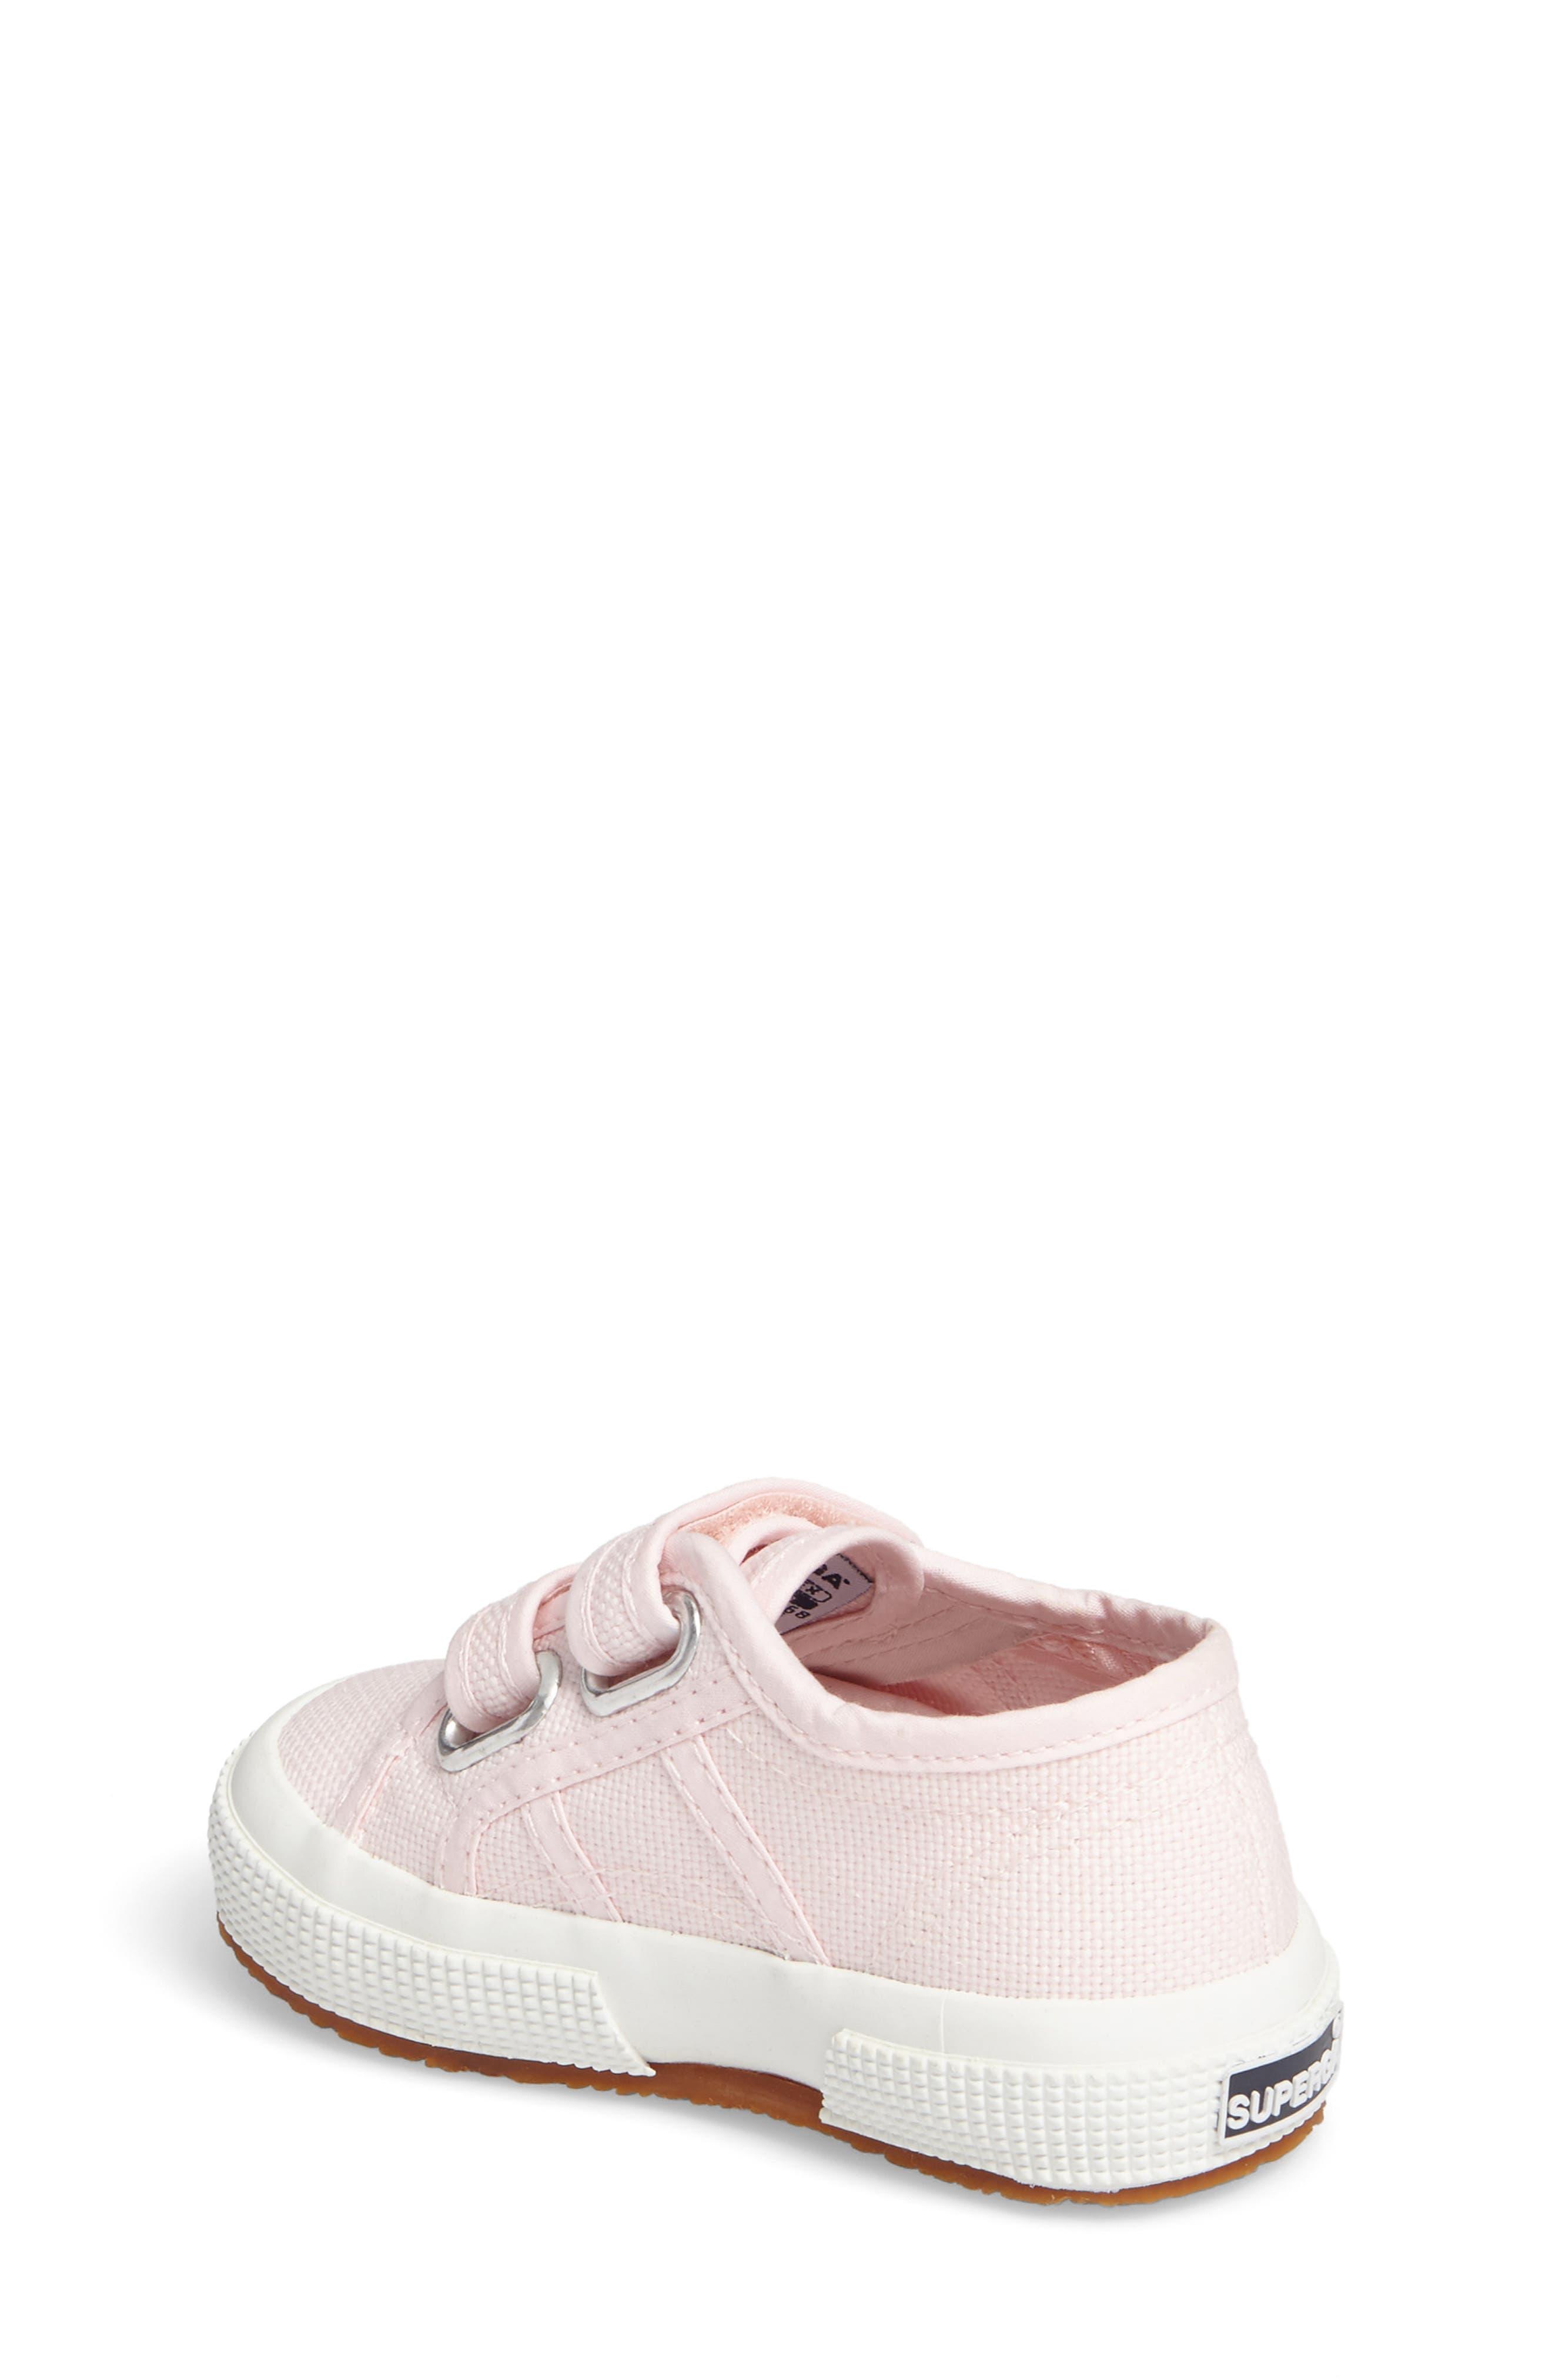 Alternate Image 2  - Superga 'Junior Classic' Sneaker (Toddler & Little Kid)